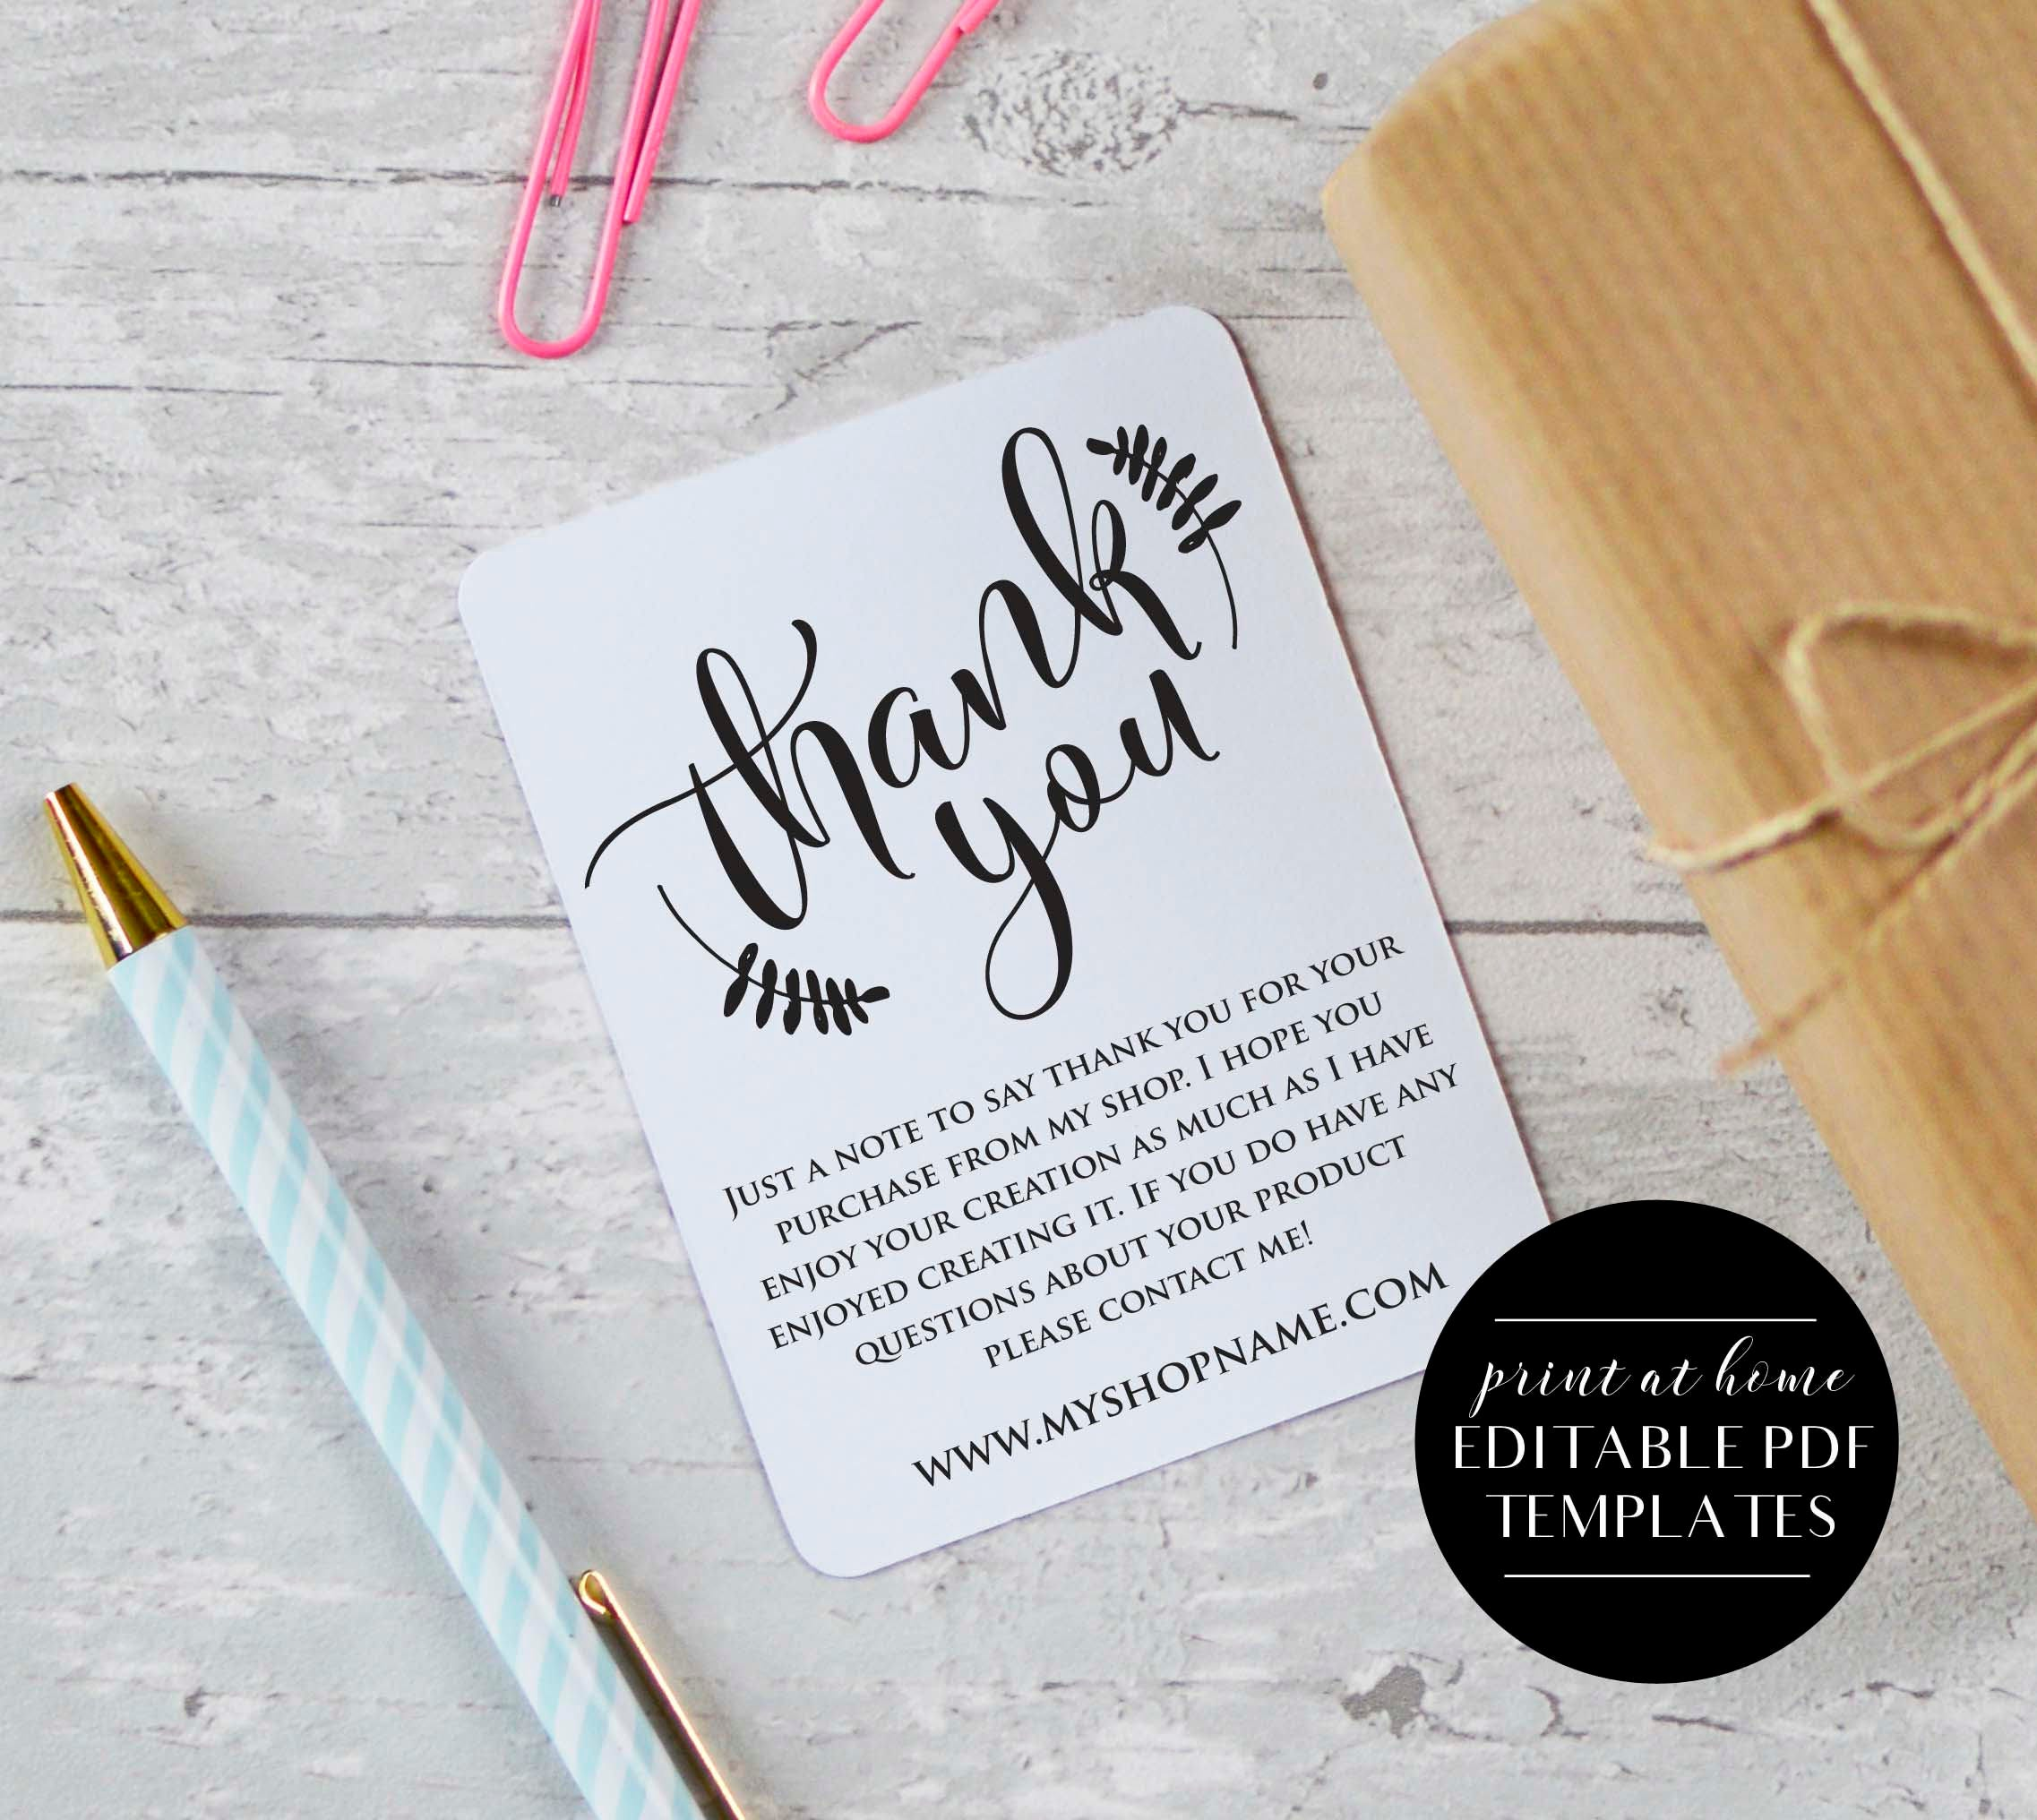 Etsy Seller Thank You Cards INSTANT DOWNLOAD Etsy Shop